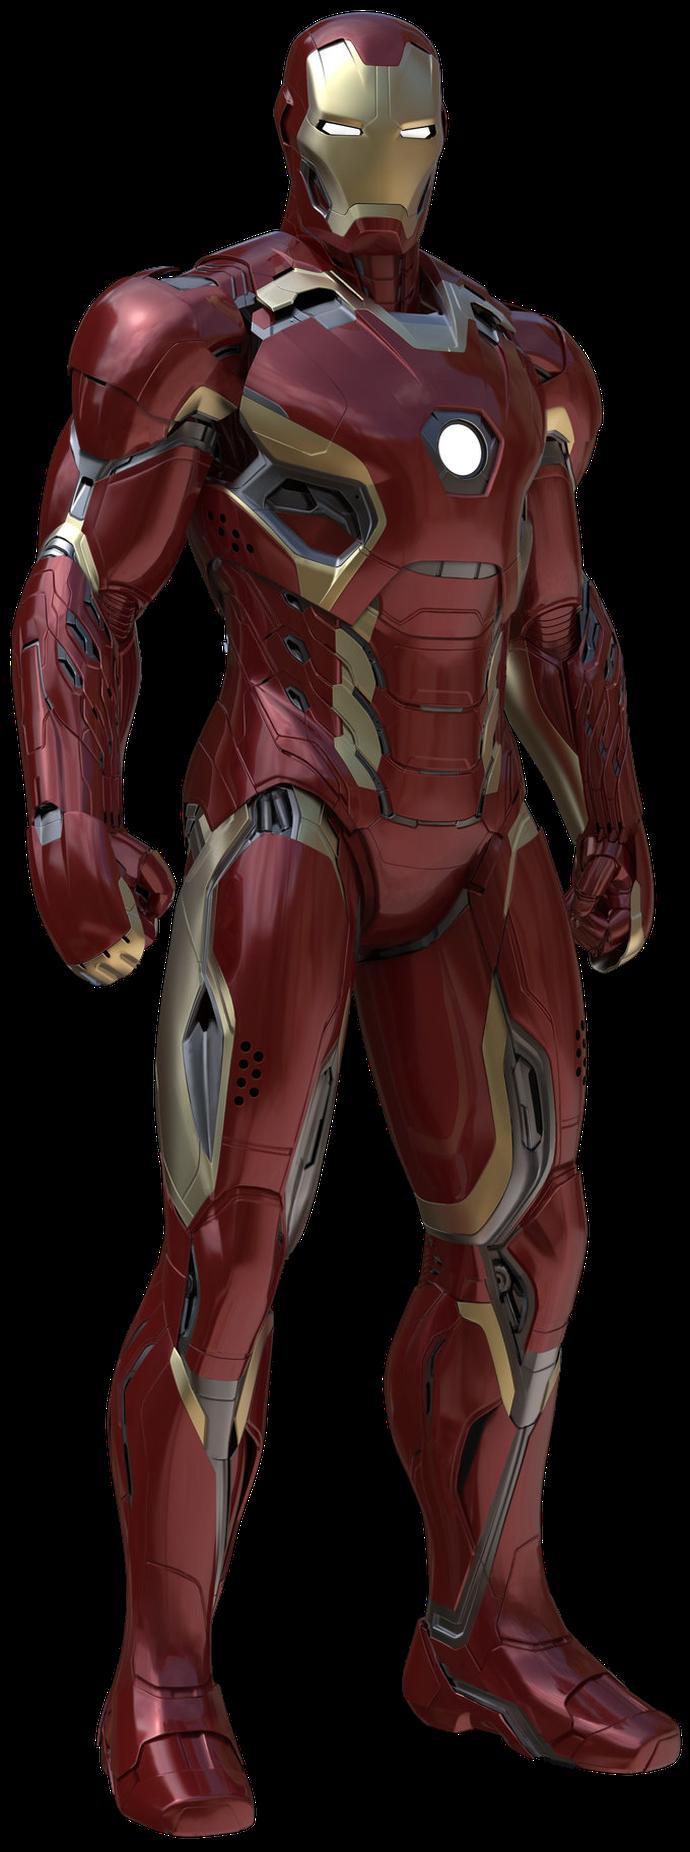 Chiem Nguong Tat Ca Bo Giap Cua Iron Man Trong Lich Su Hon 50 Nam Png 690 1 852 Pixels Iron Man Armor Iron Man Iron Man Tony Stark